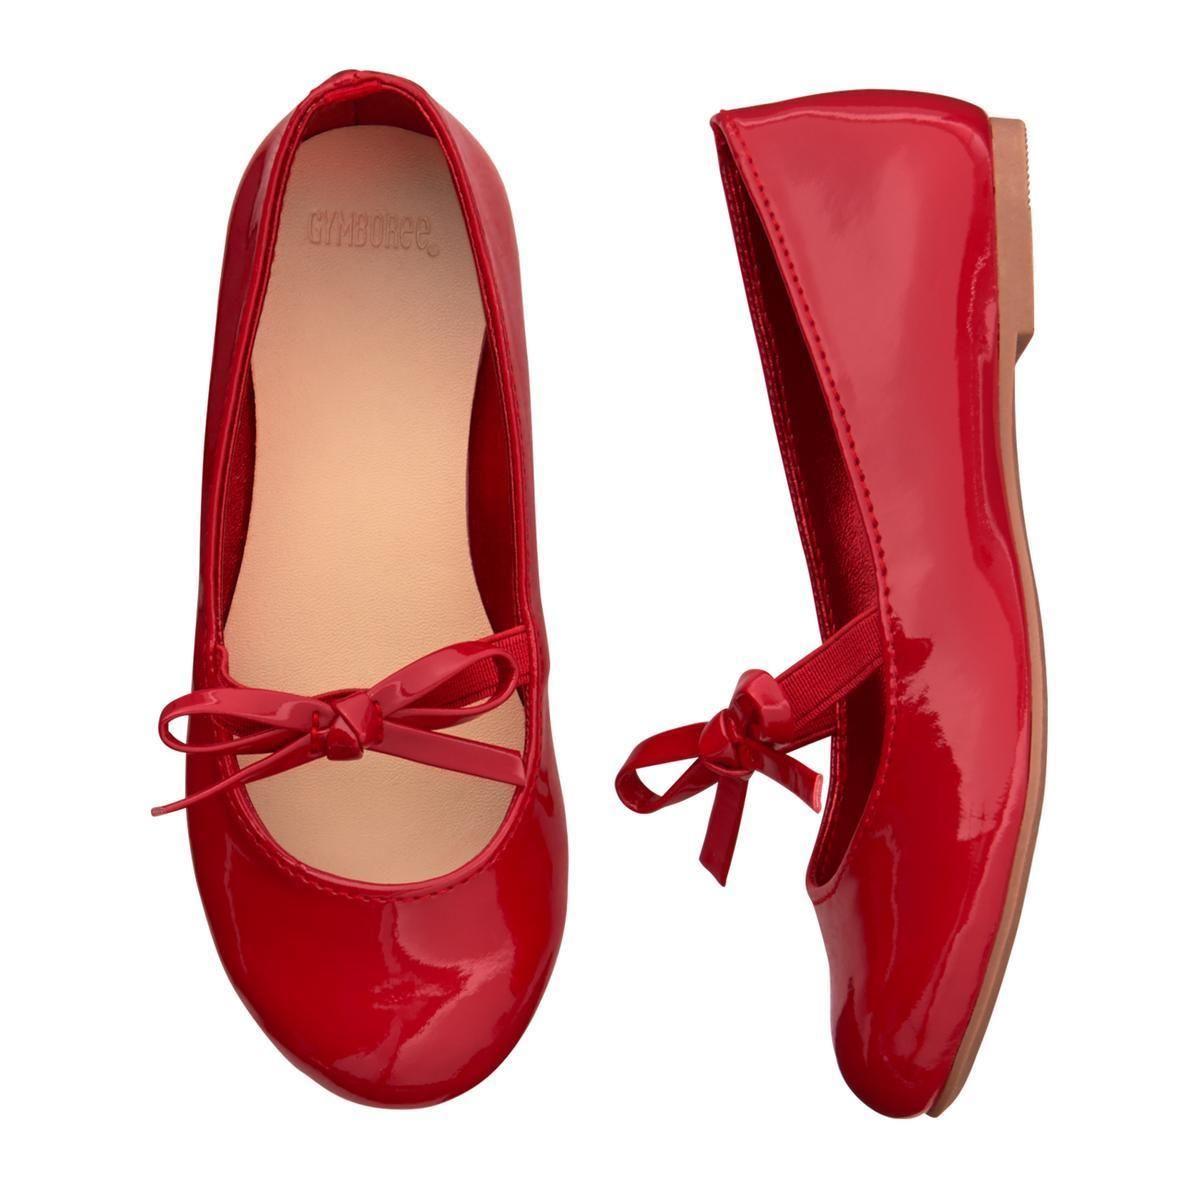 04fef4a87033 NWT Gymboree North Pole Party Red Flats Dress shoes Toddler girls ManySizes  Kleding en accessoires Schoenen